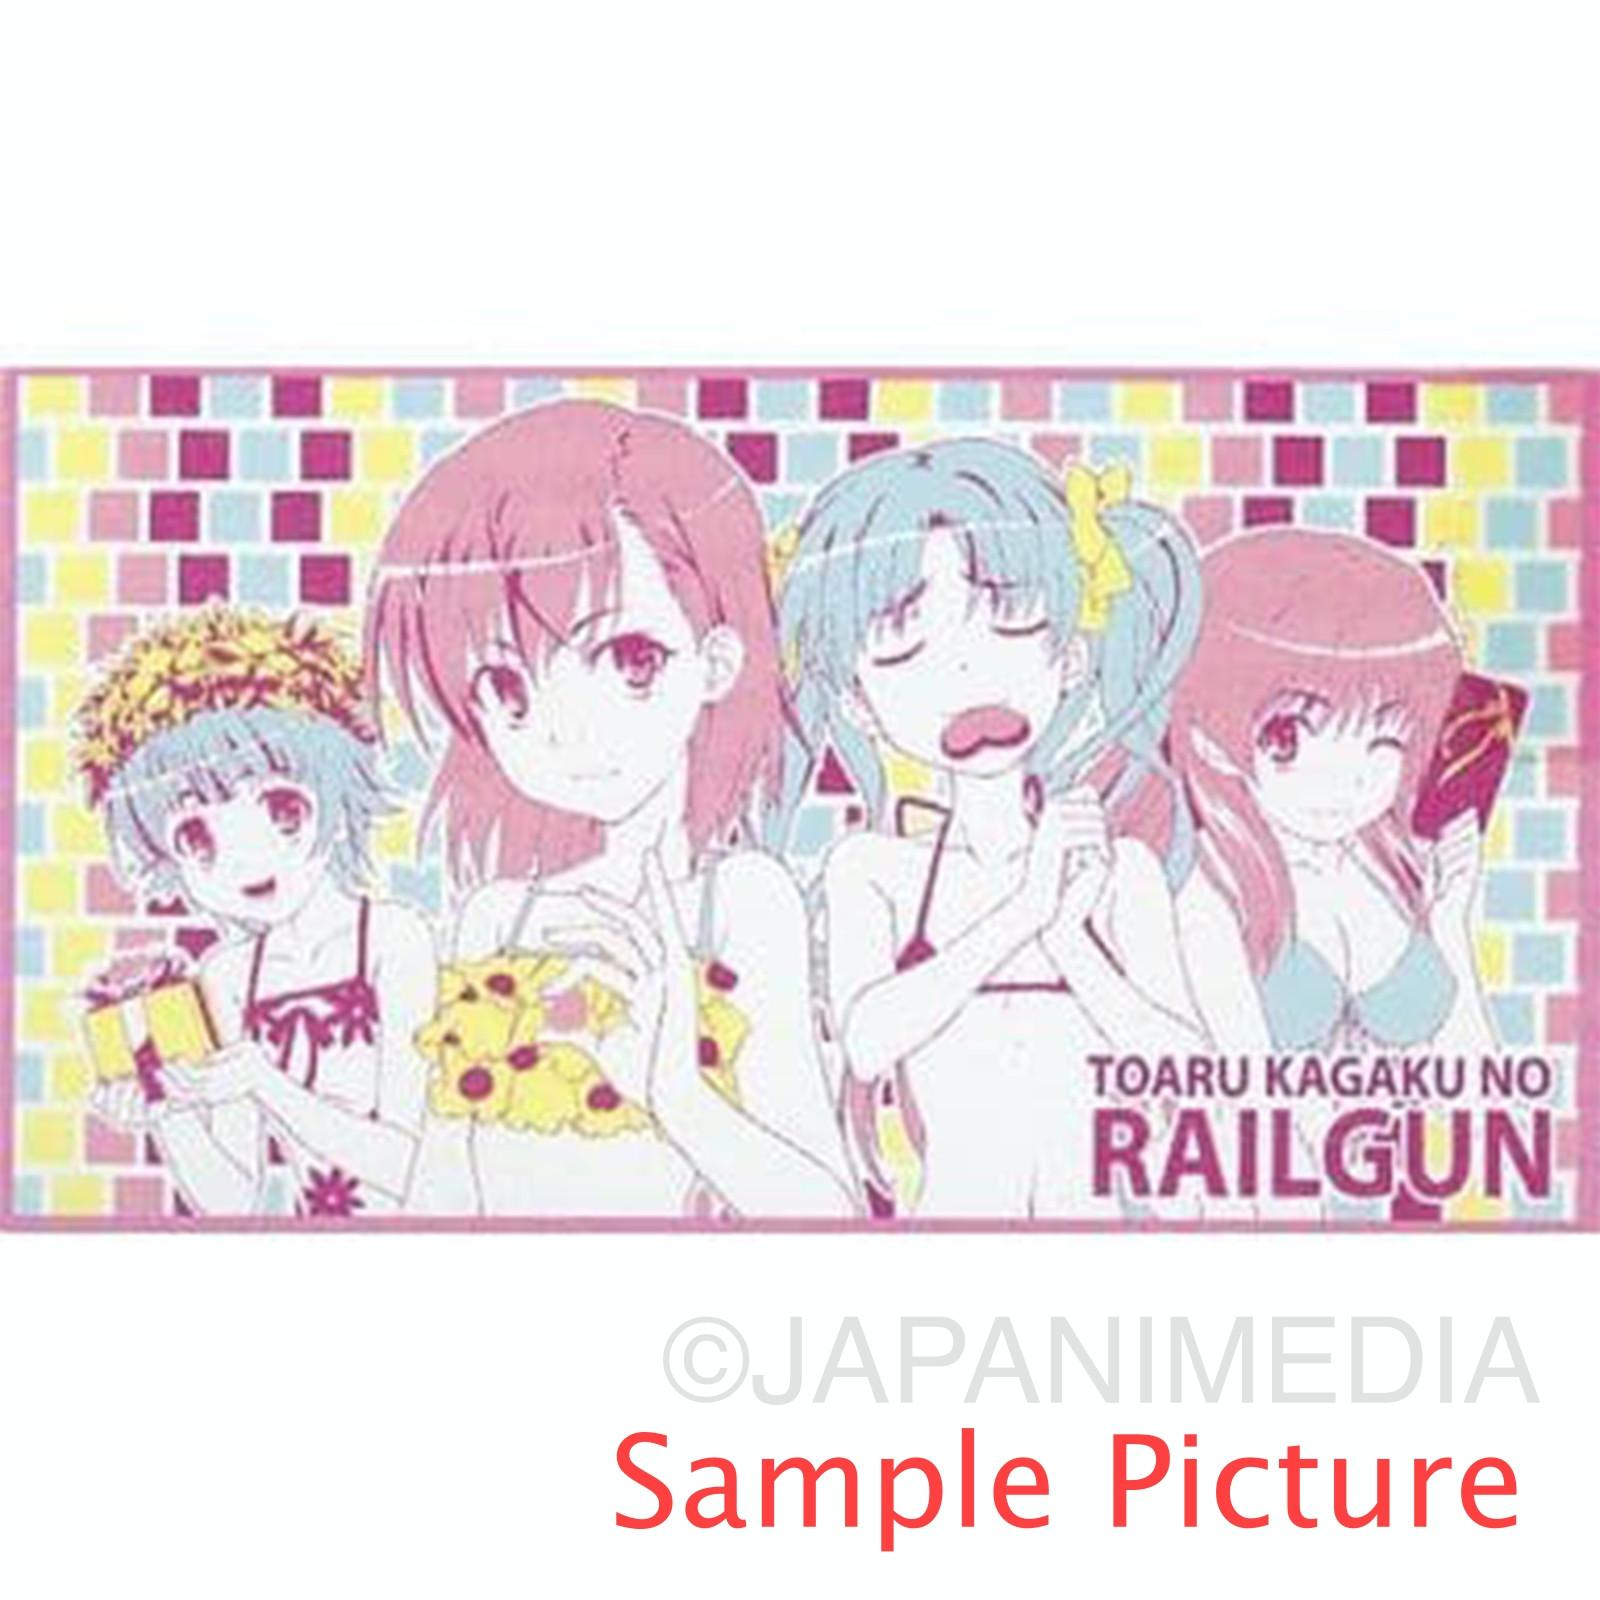 A Certain Scientific Railgun Summer Towel Blanket 80x150cm #1 JAPAN ANIME